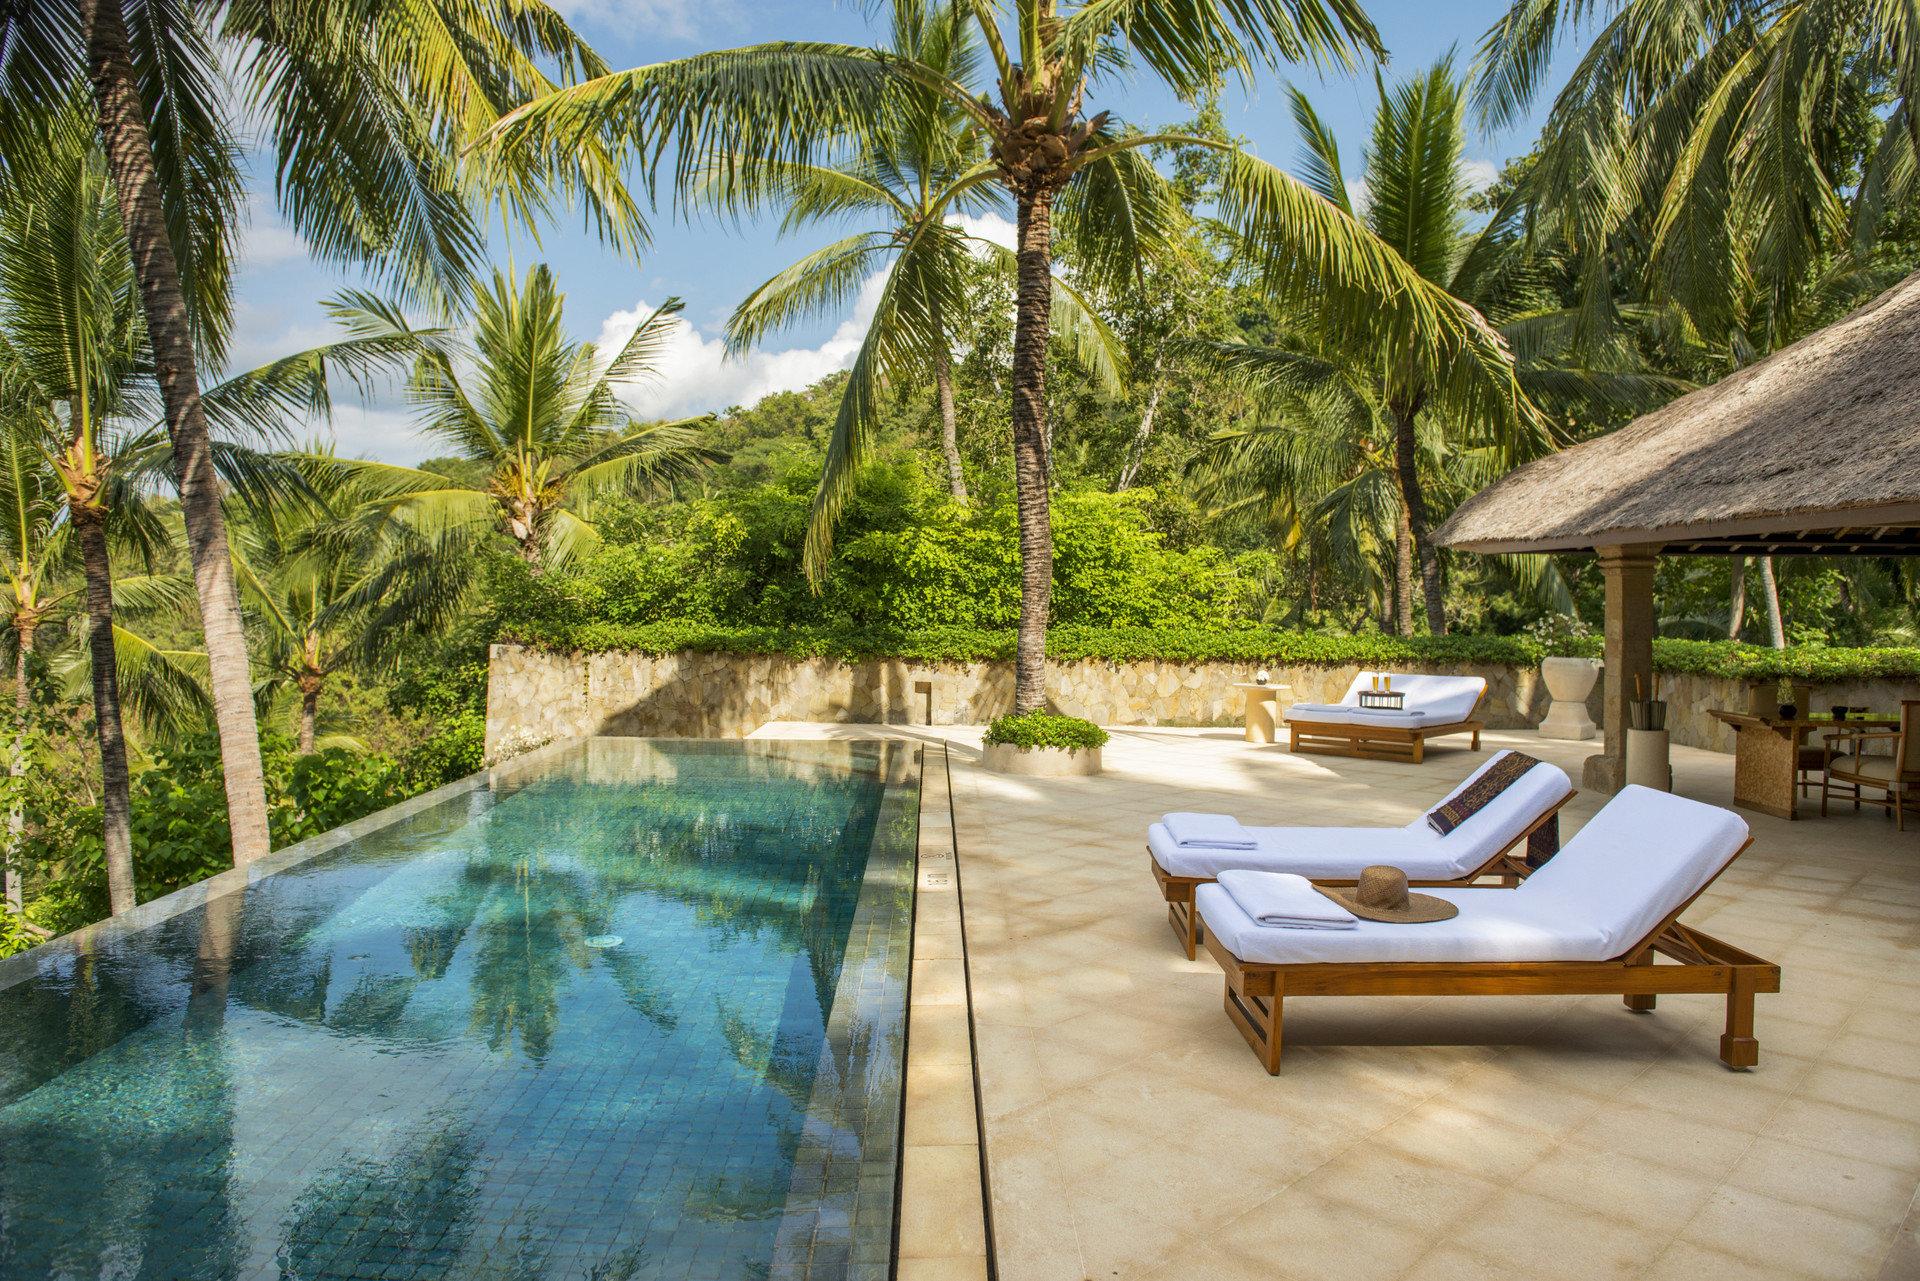 Health Wellness Hotels Tree Outdoor Swimming Pool Leisure Property Resort Estate Vacation Palm Villa Backyard